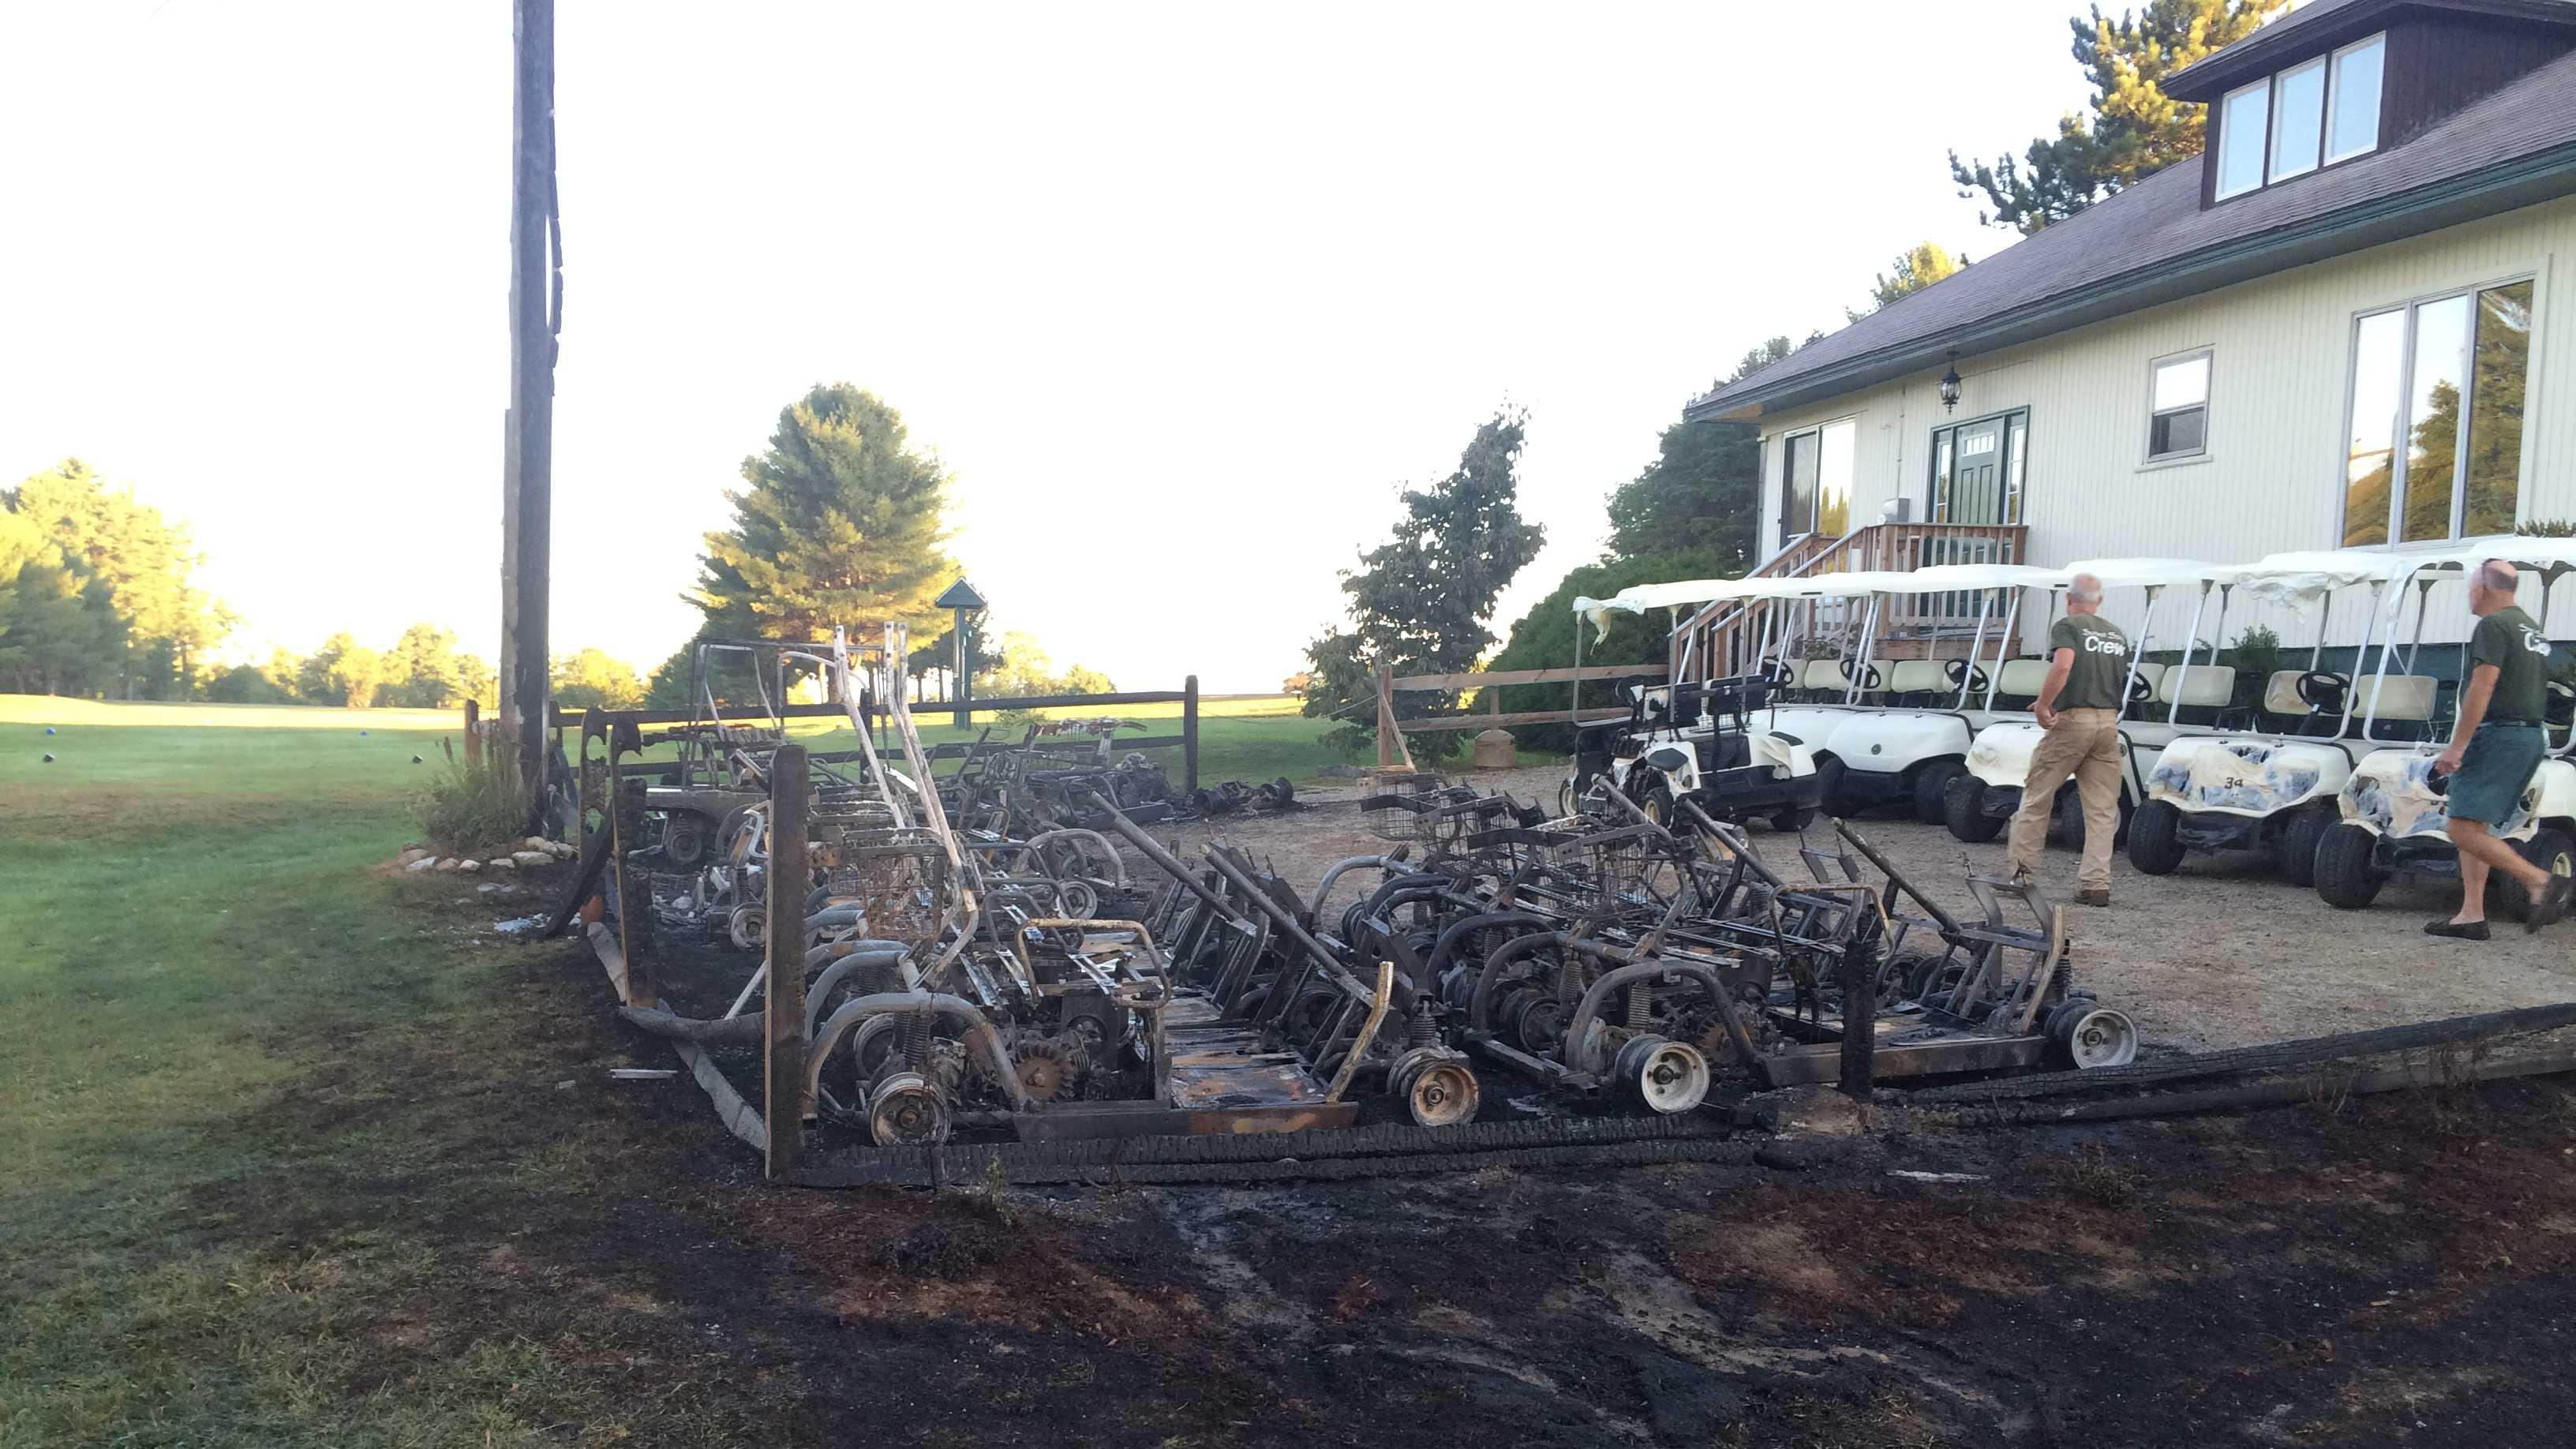 Summit Spring golf carts vandalized